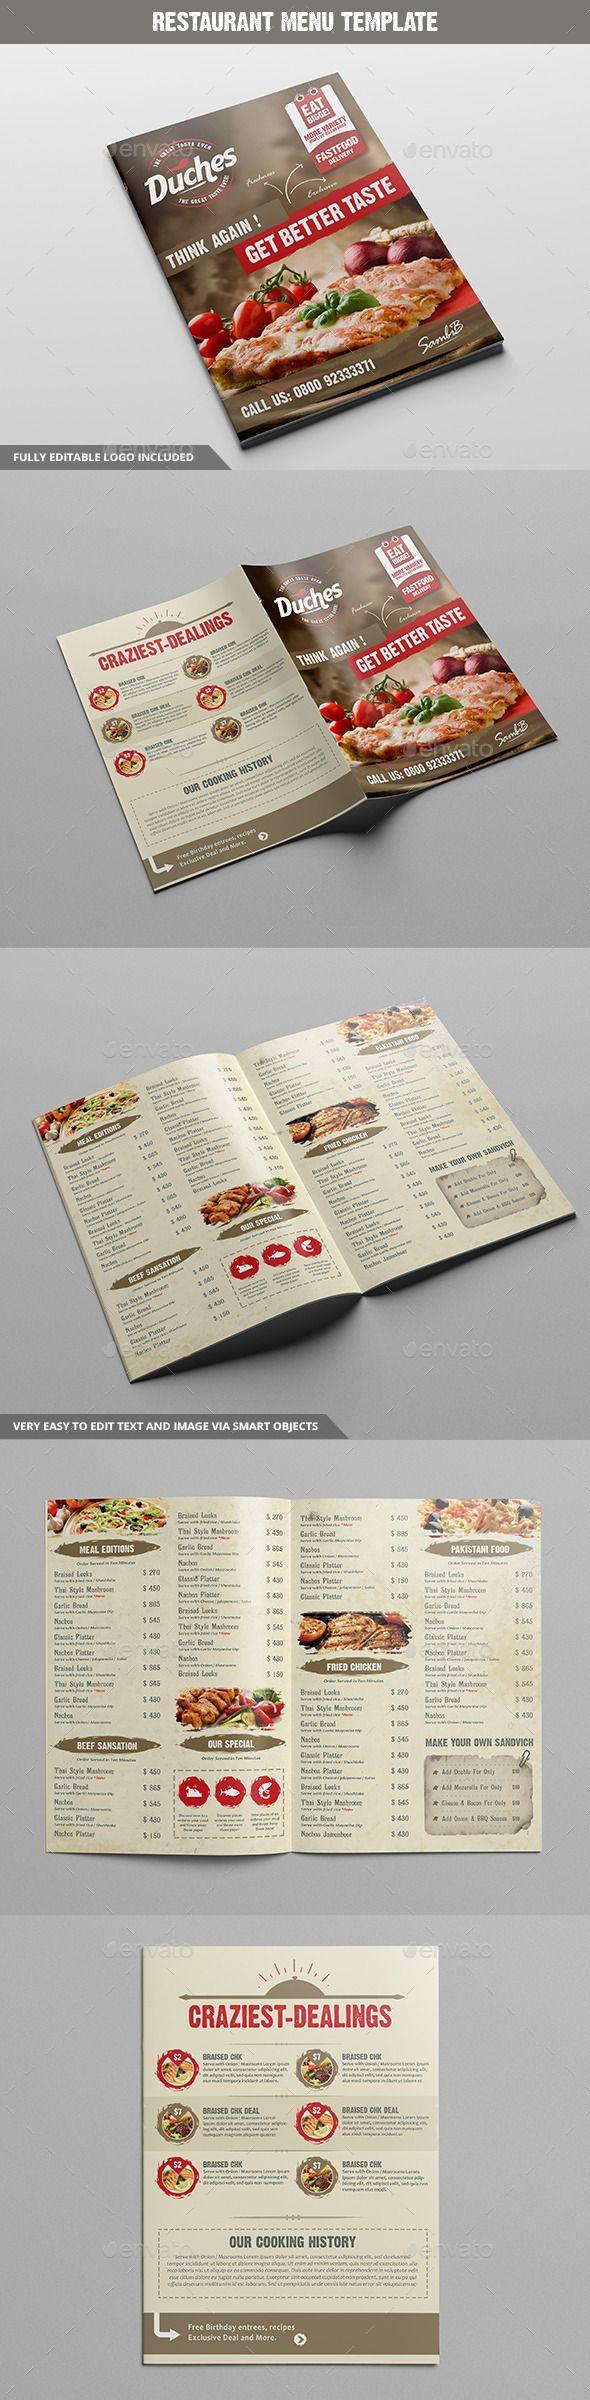 Restaurant Menu Template #design Download: http://graphicriver.net/item/restaurant-menu/11717091?ref=ksioks